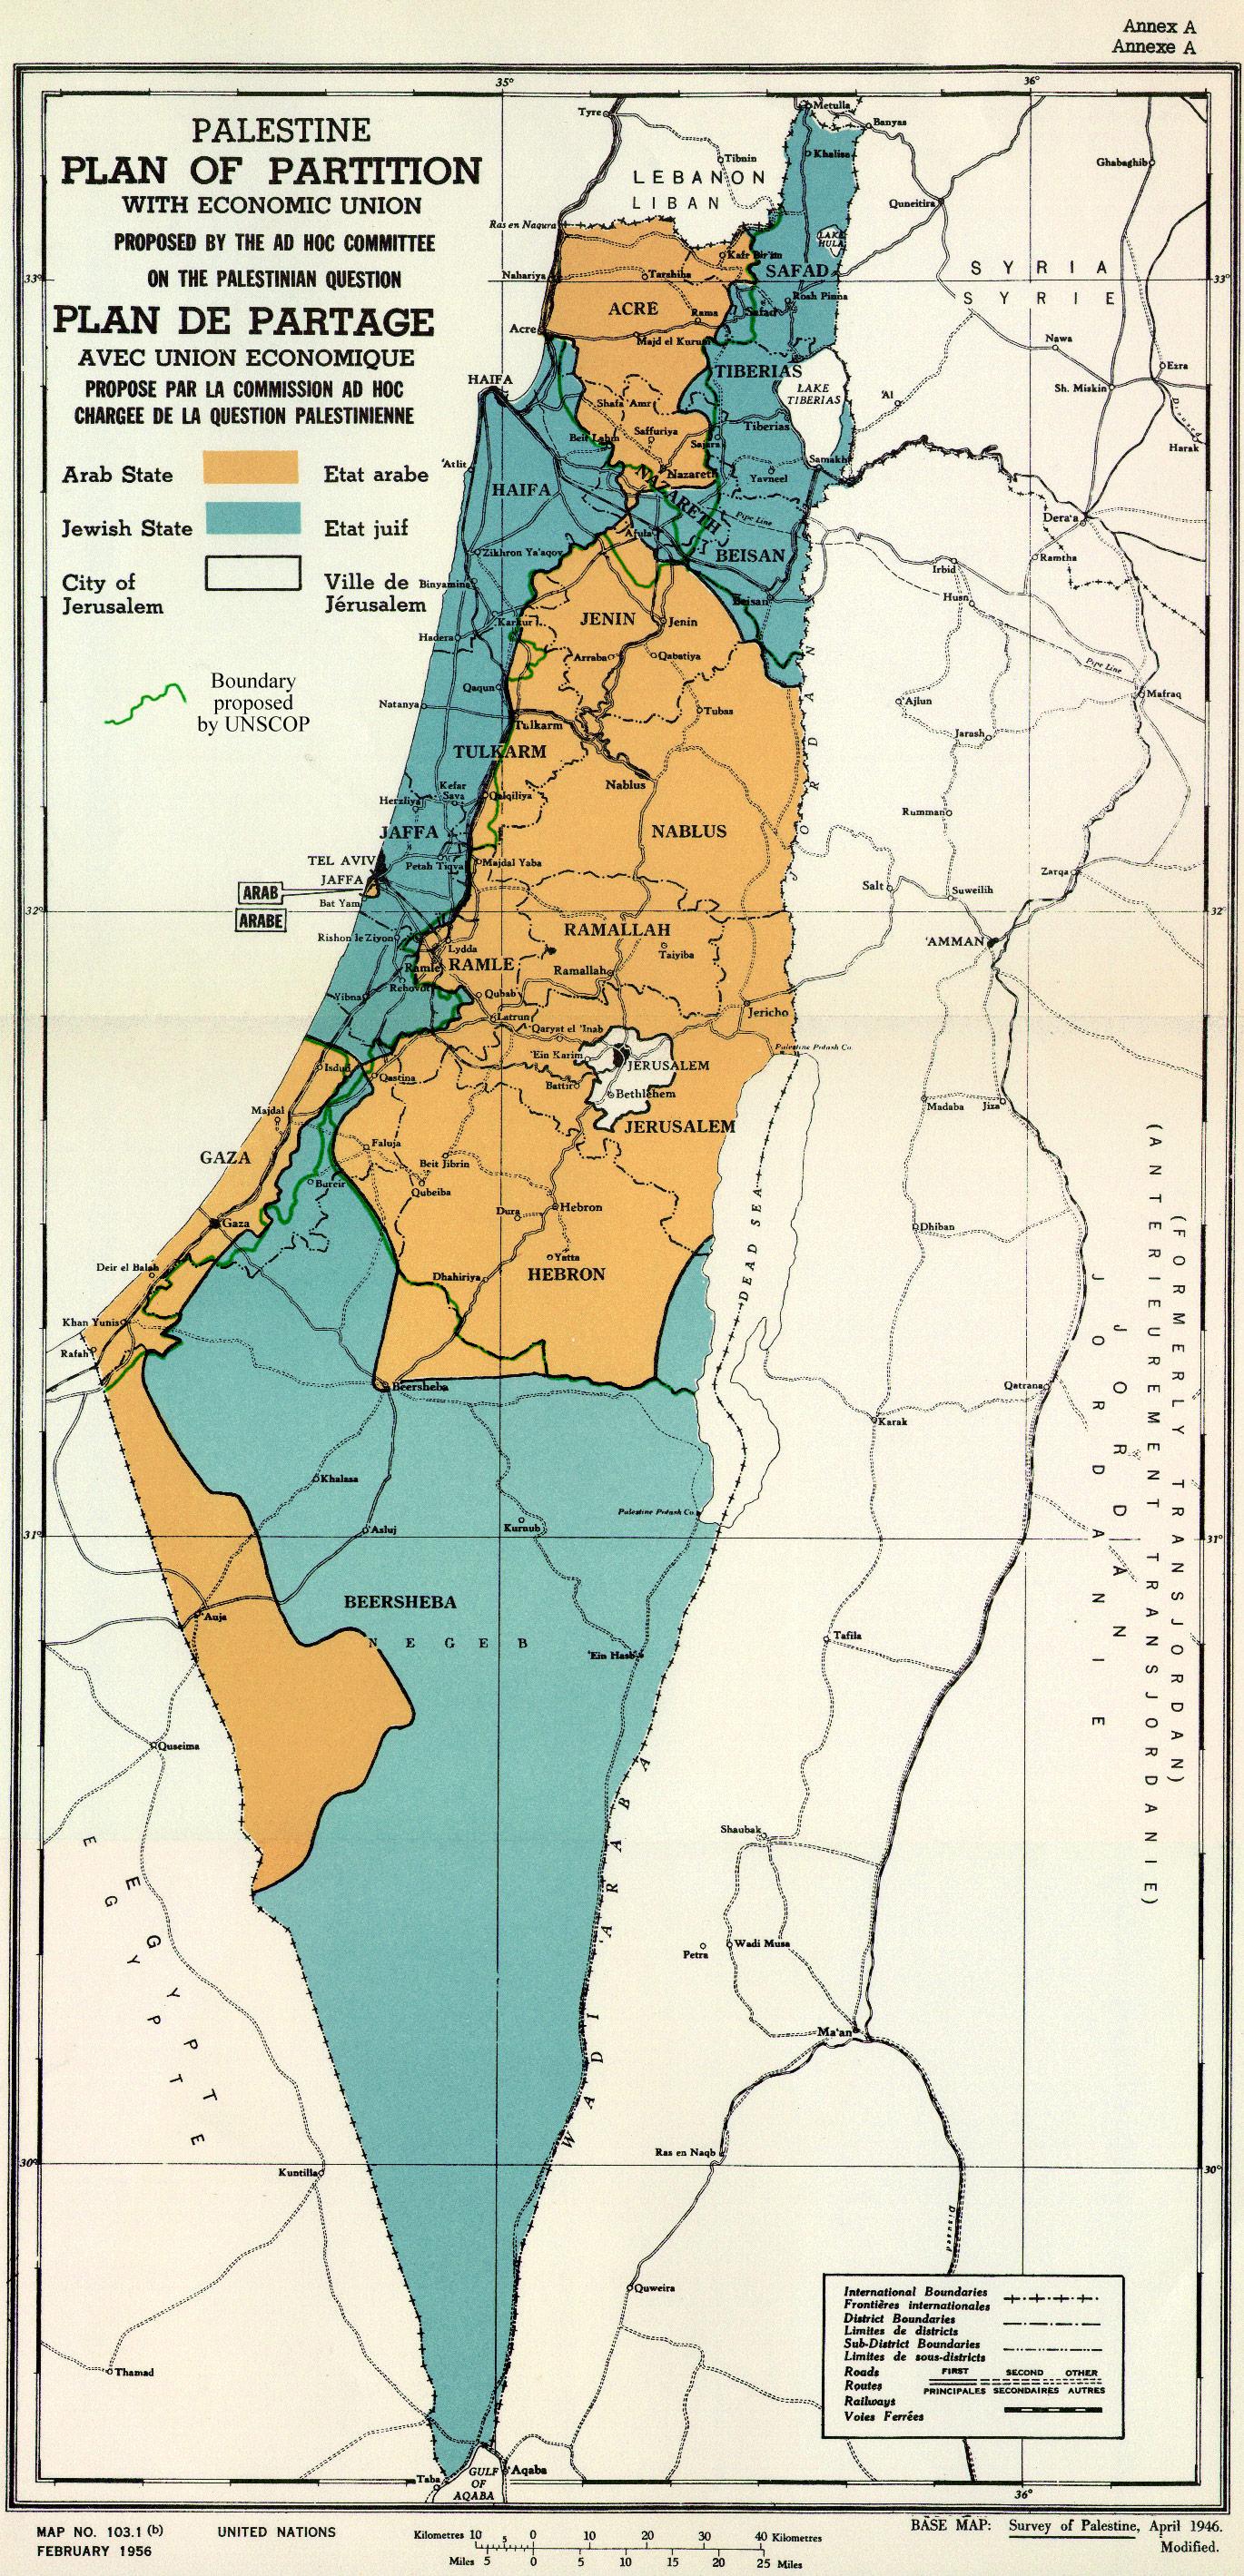 UN_Palestine_Partition_Versions_1947.jpg